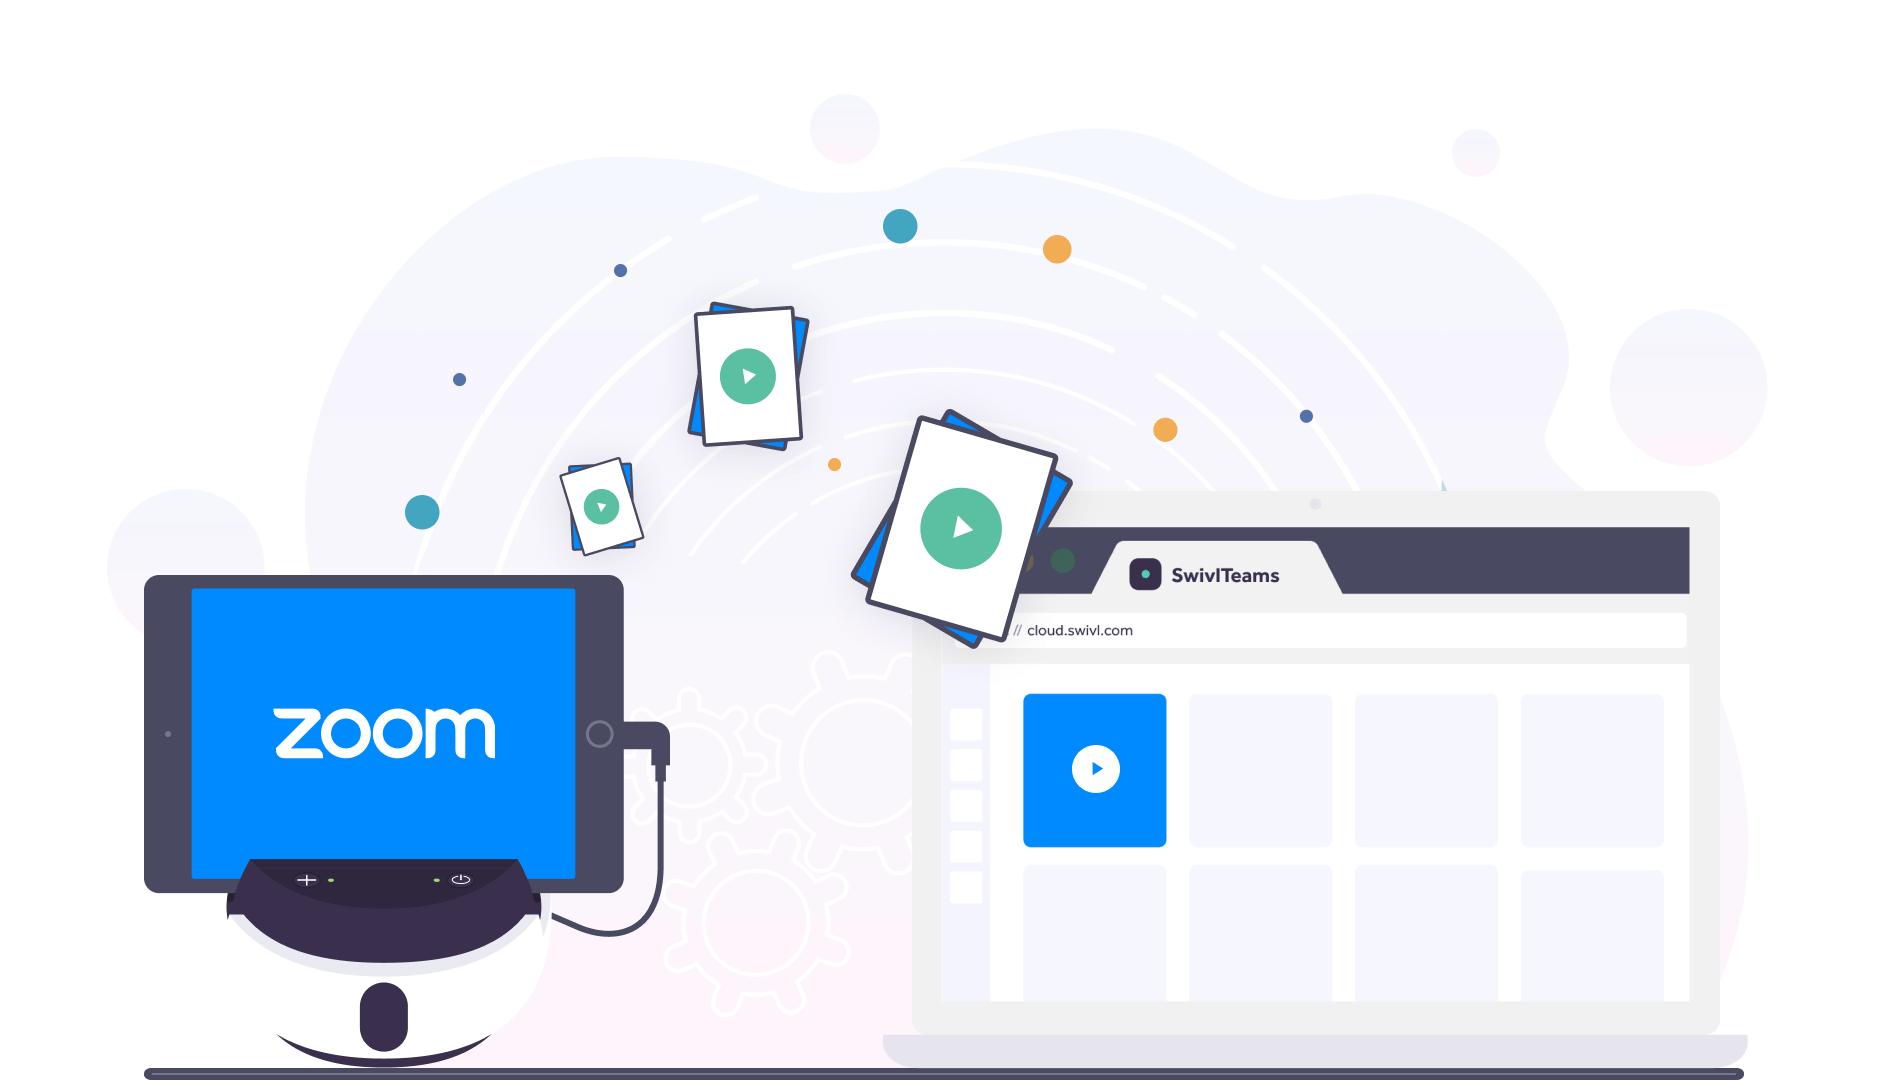 Swivl & Zoom Integration